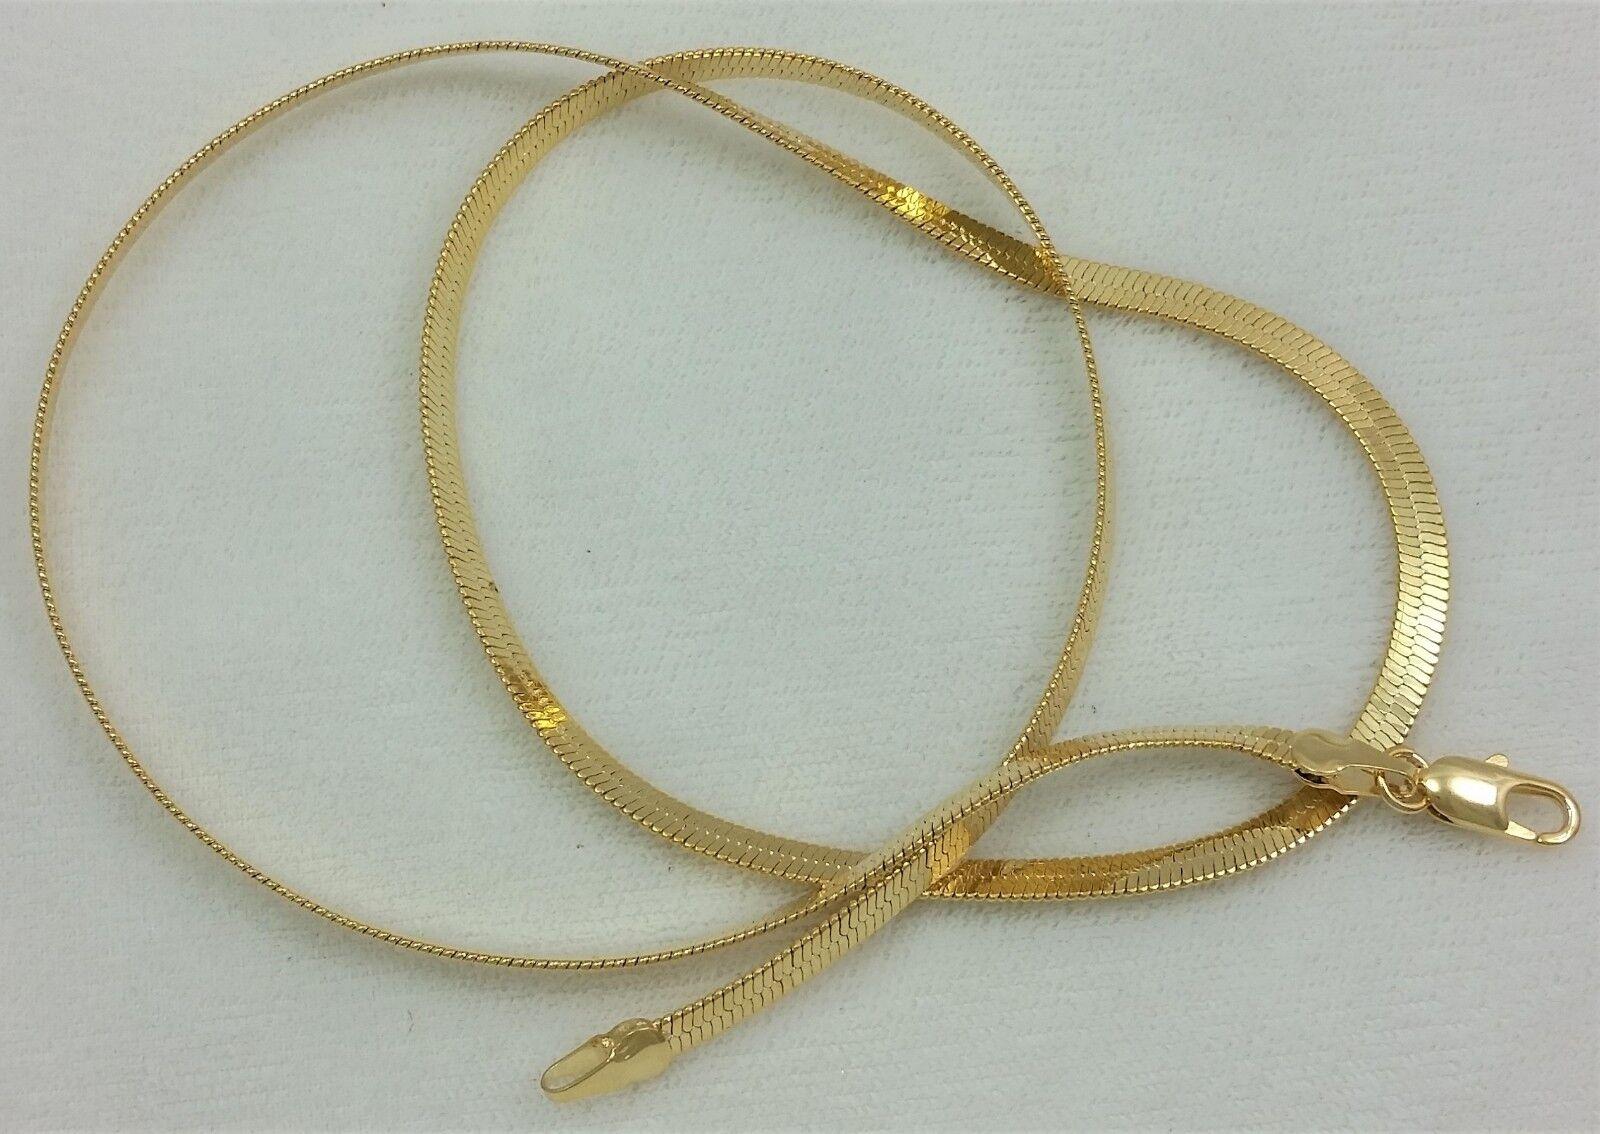 Bonyak Jewelry 18 Inch Rhodium Plated Necklace w// 4mm Purple February Birth Month Stone Beads and Cross Charm